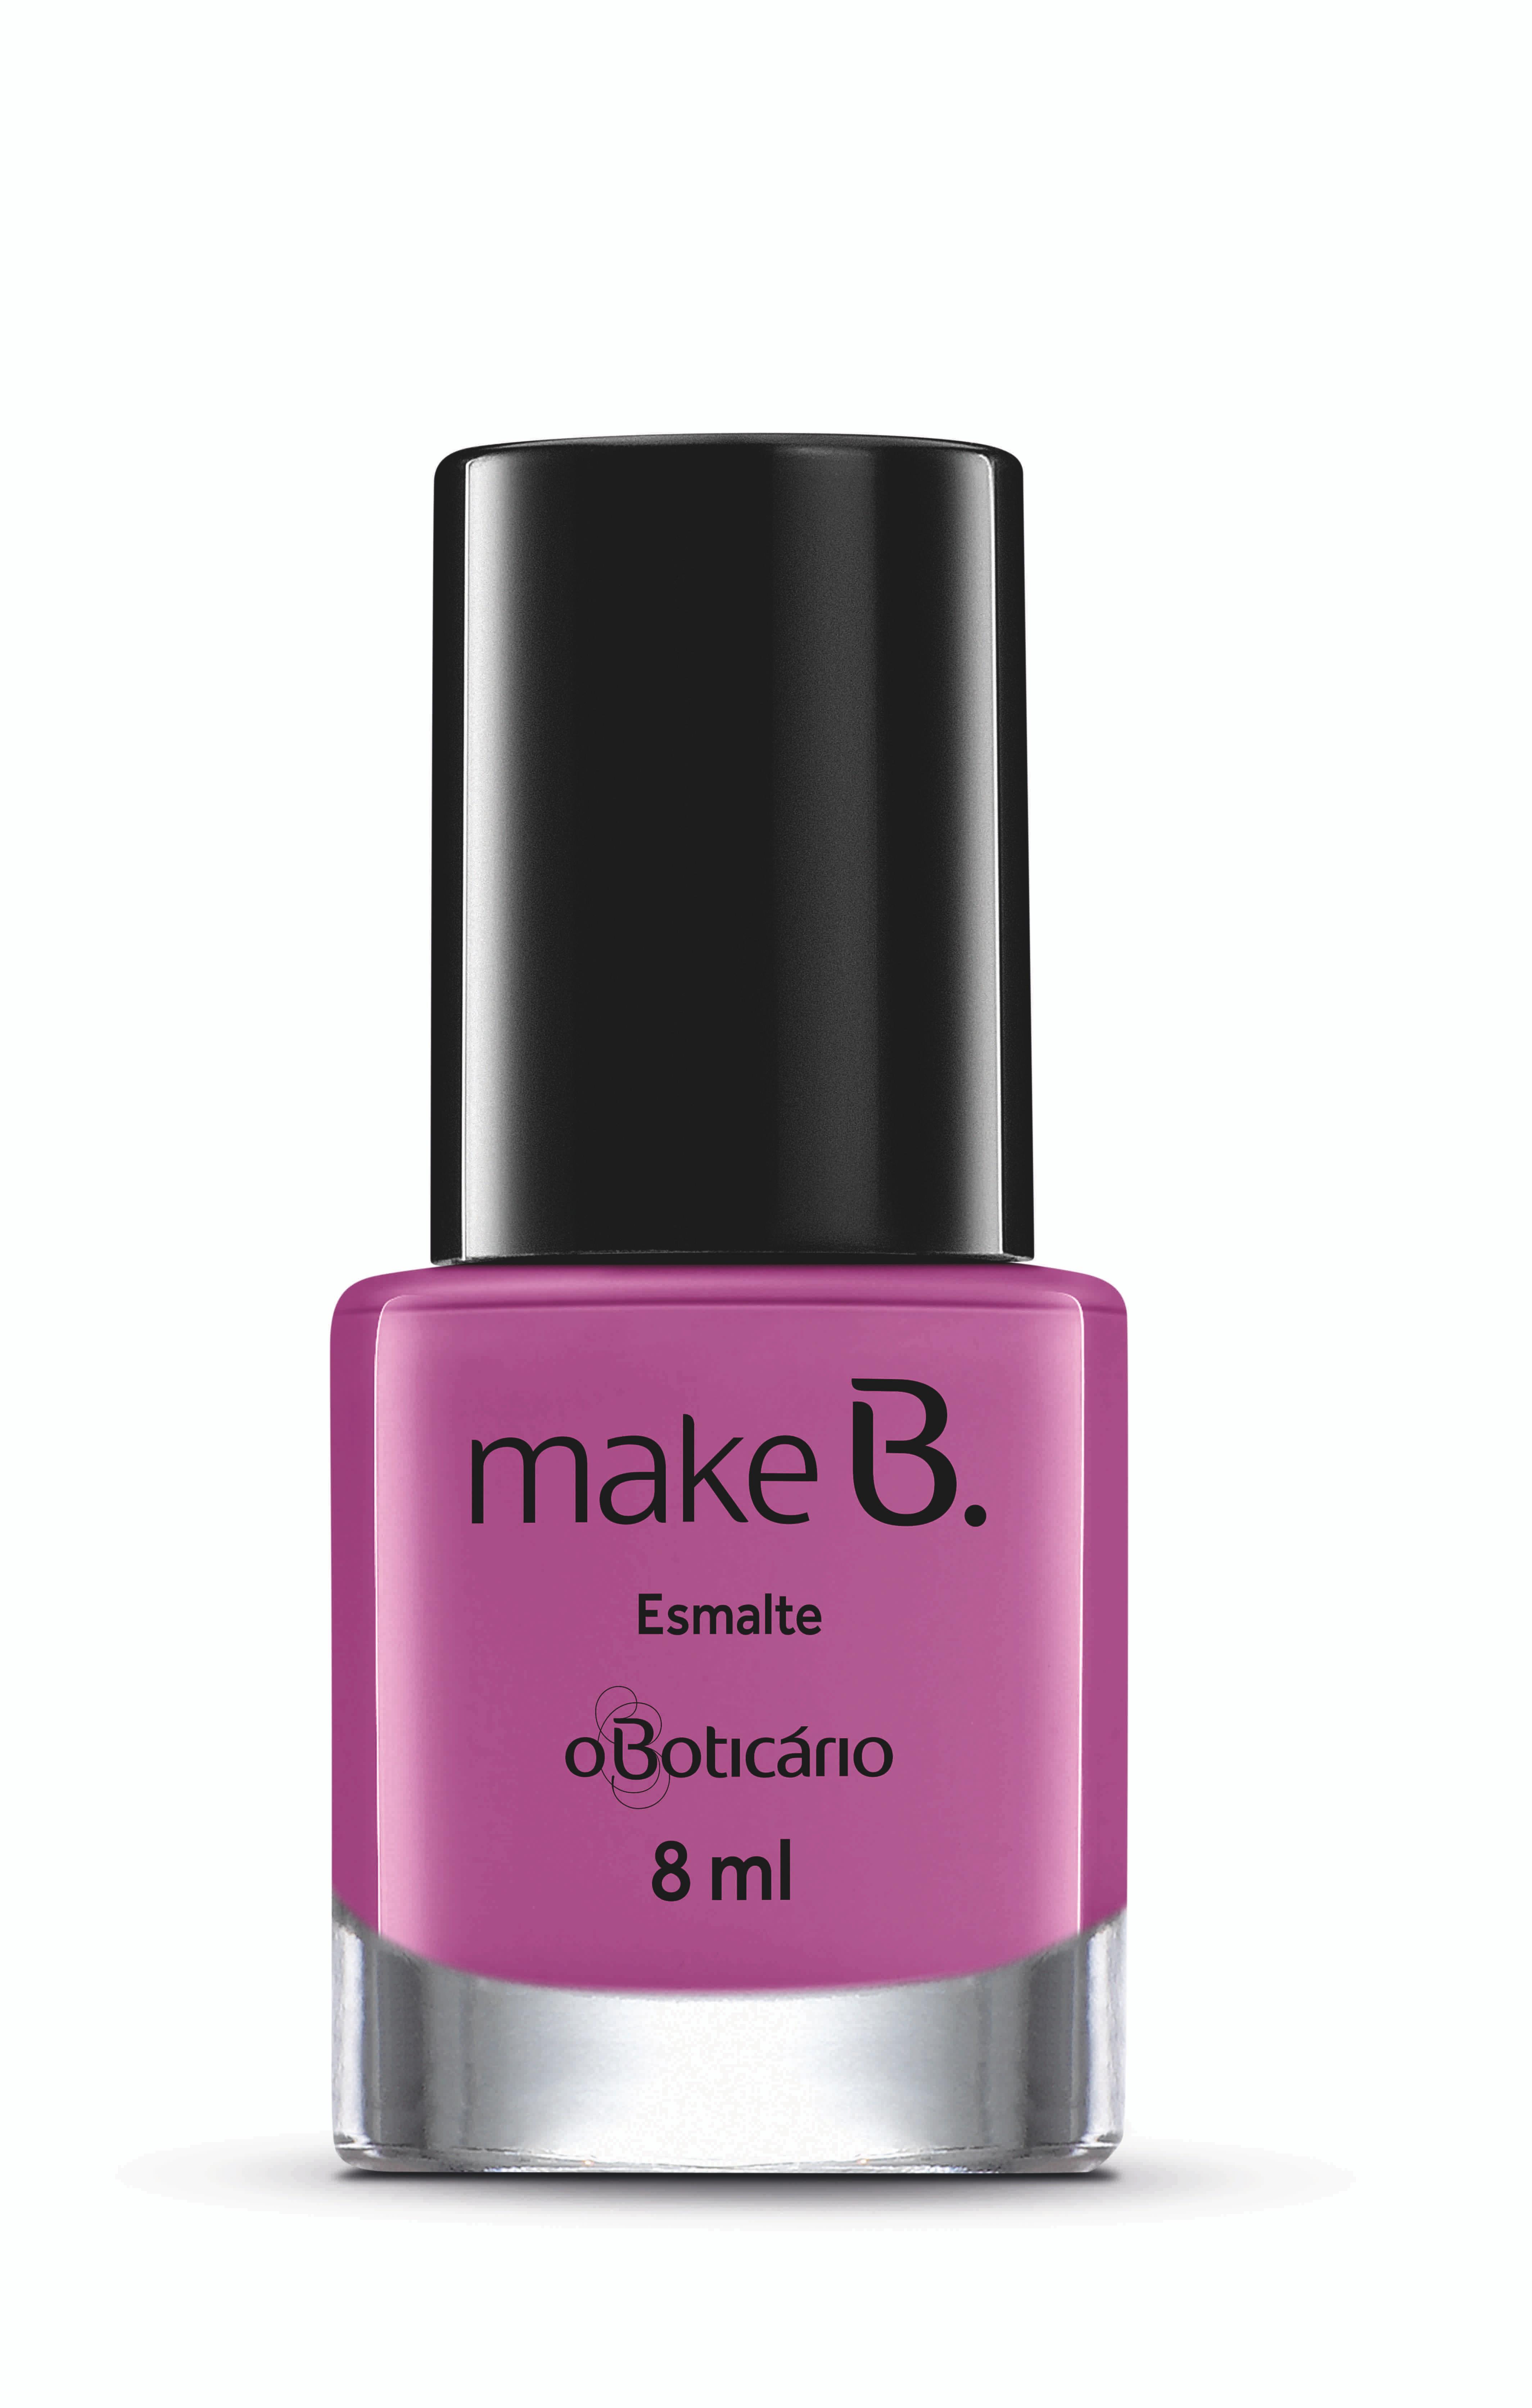 Make B. Barbie Verniz Glam Lilac   4,99€